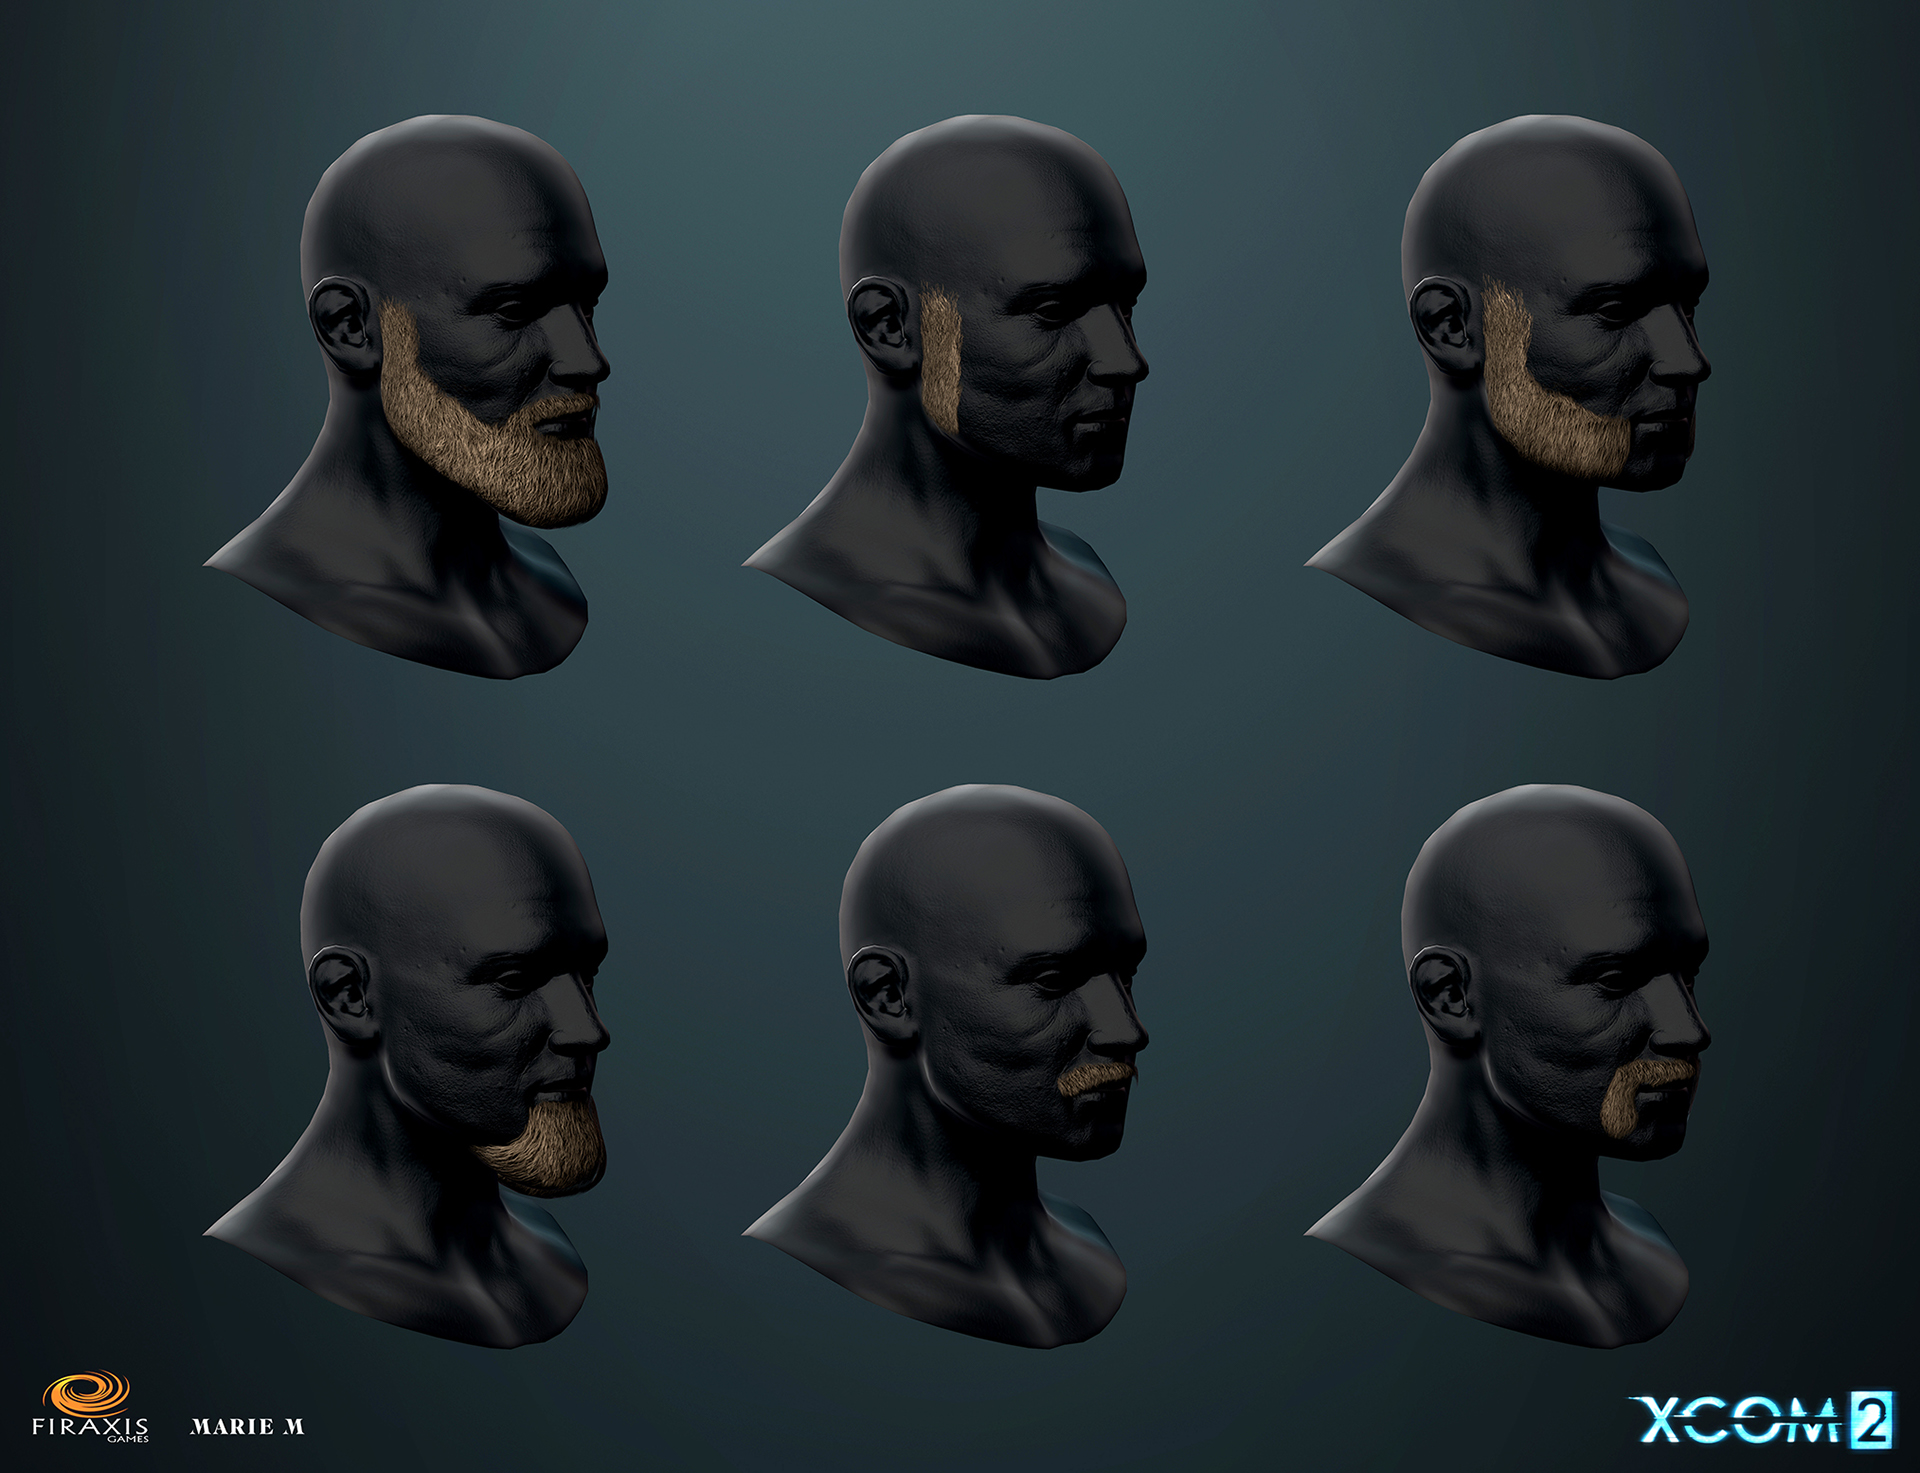 Ffxiv Beard — Available Space Miami